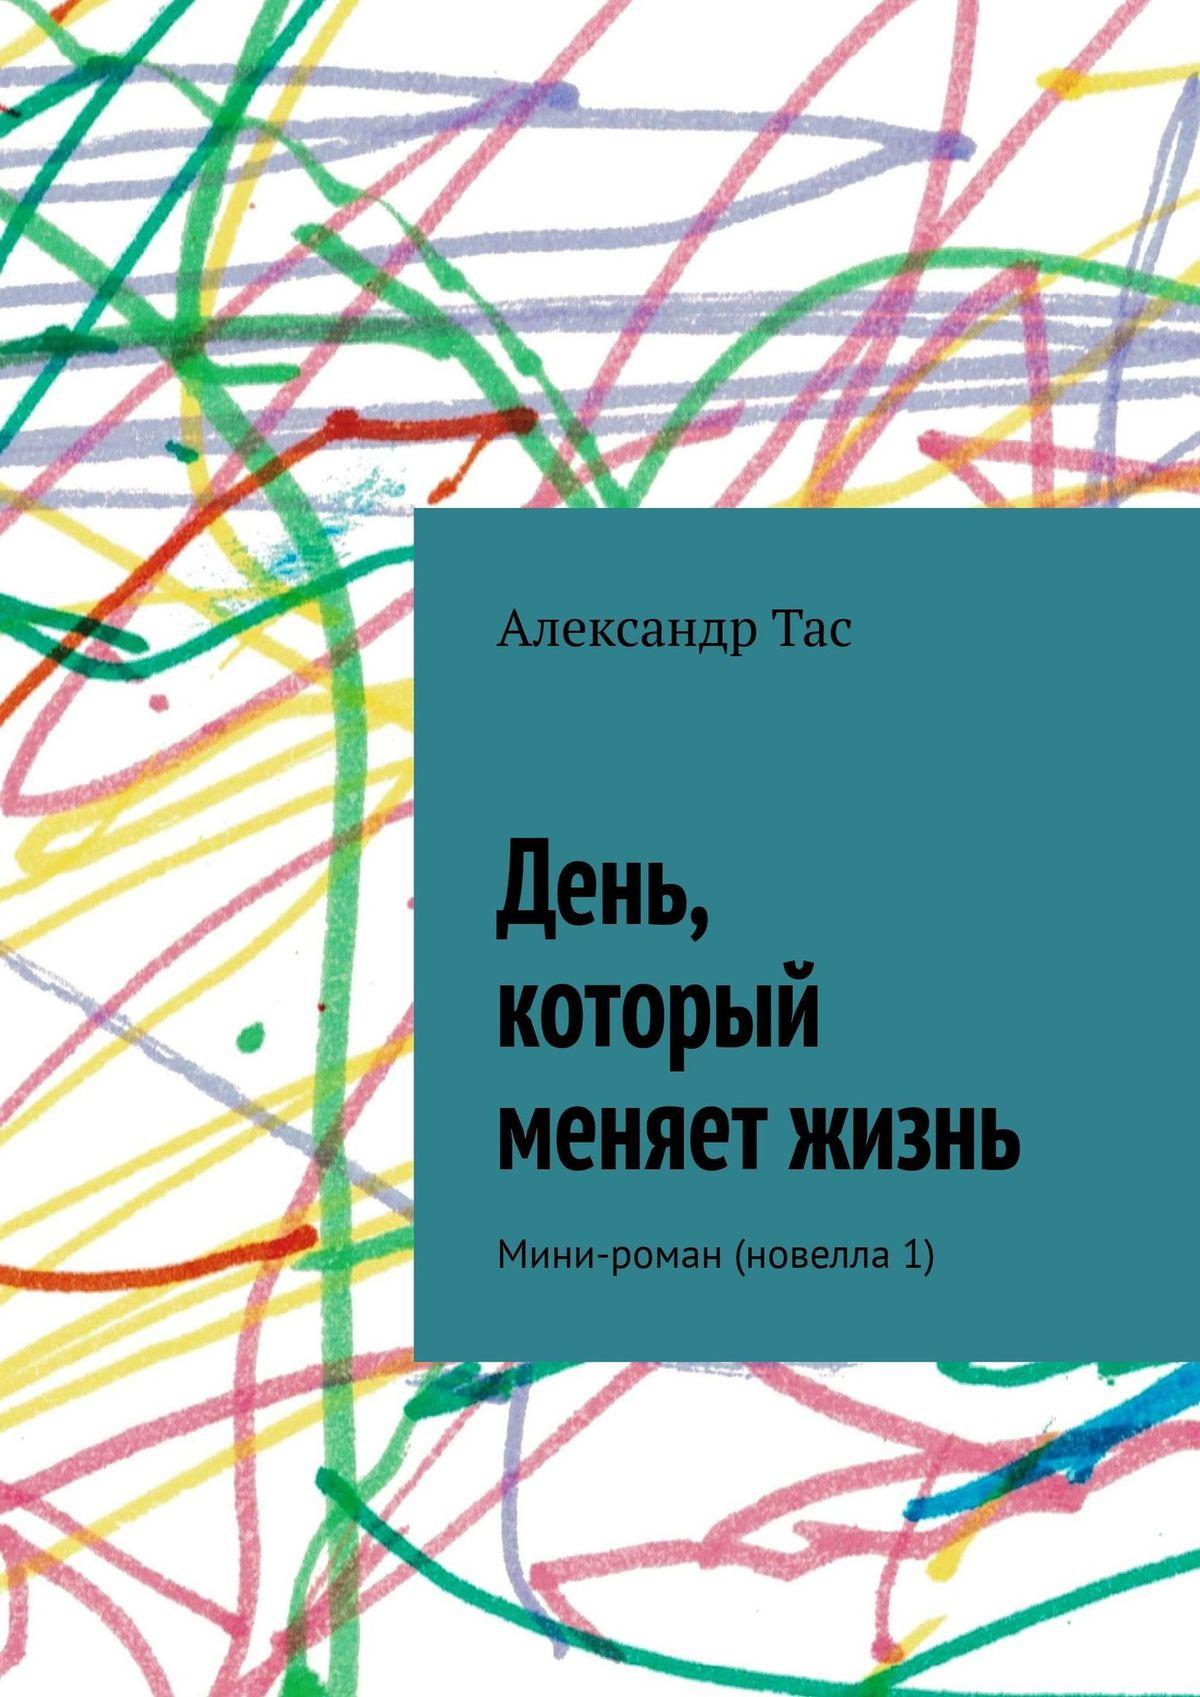 Александр Тас День, который меняет жизнь. Мини-роман (новелла 1) цена